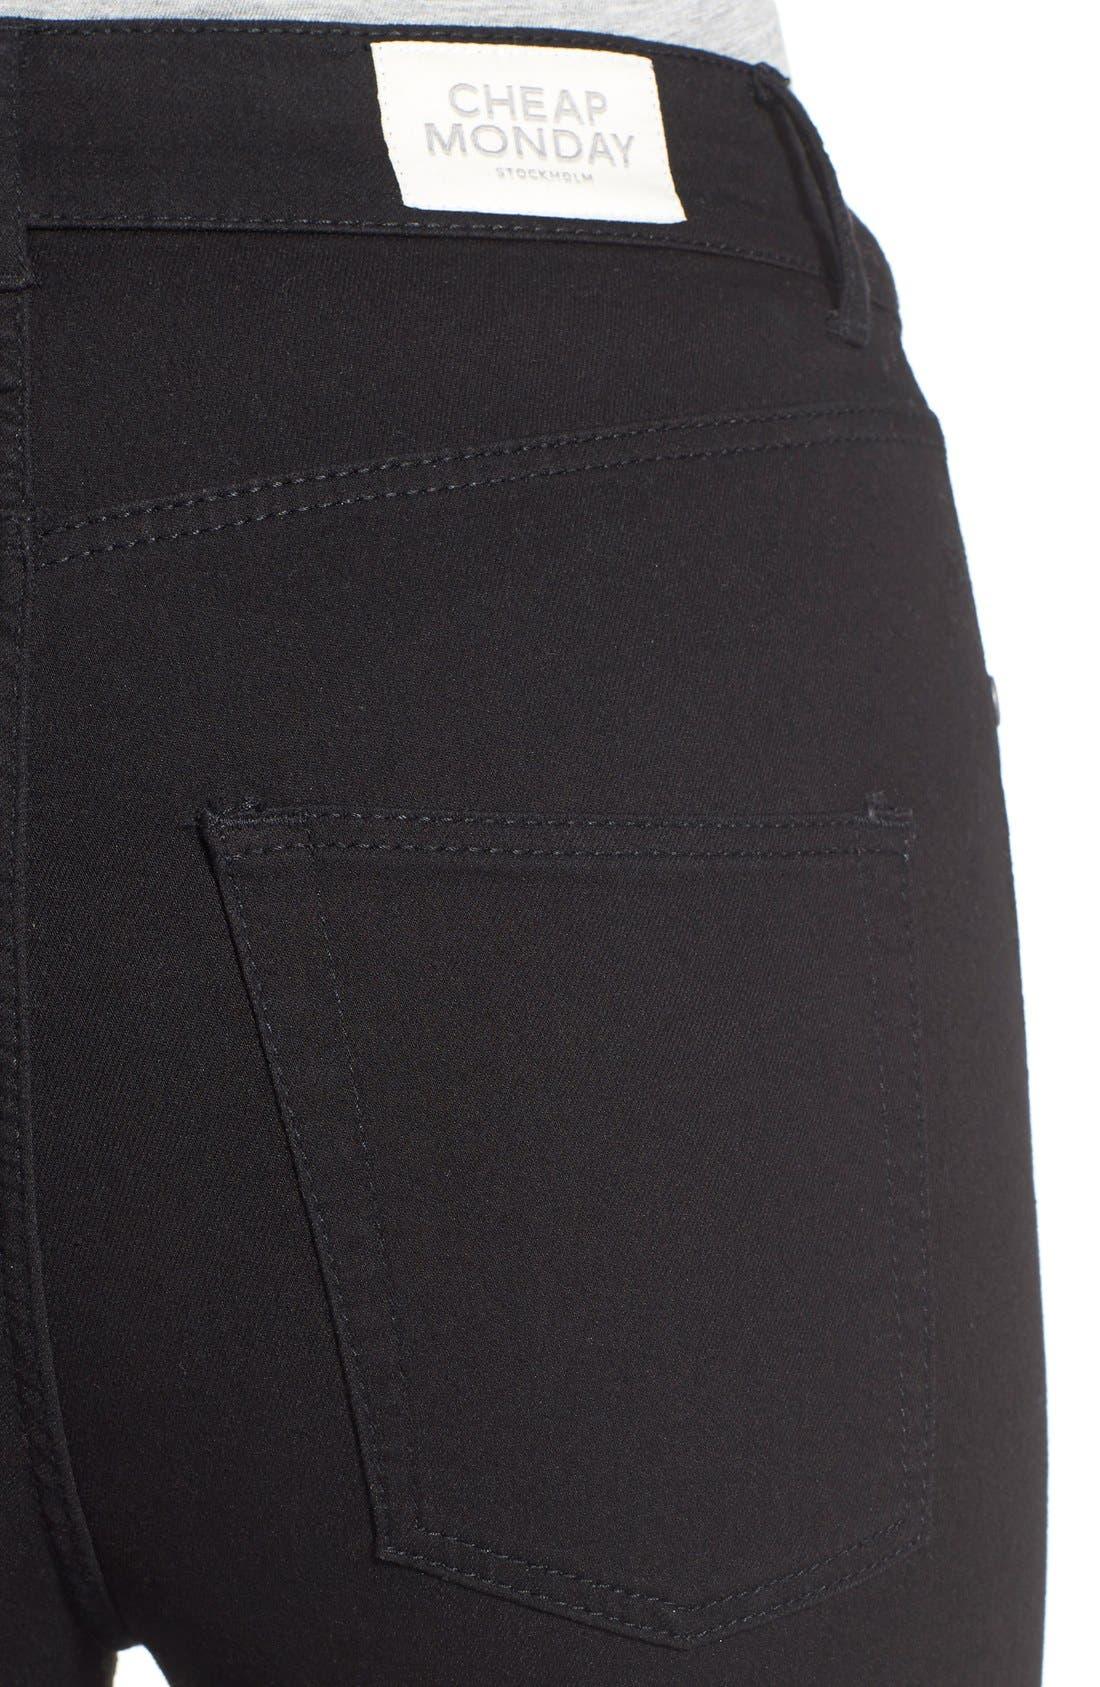 Alternate Image 4  - Cheap Monday High Rise Super Skinny Jeans (Black)